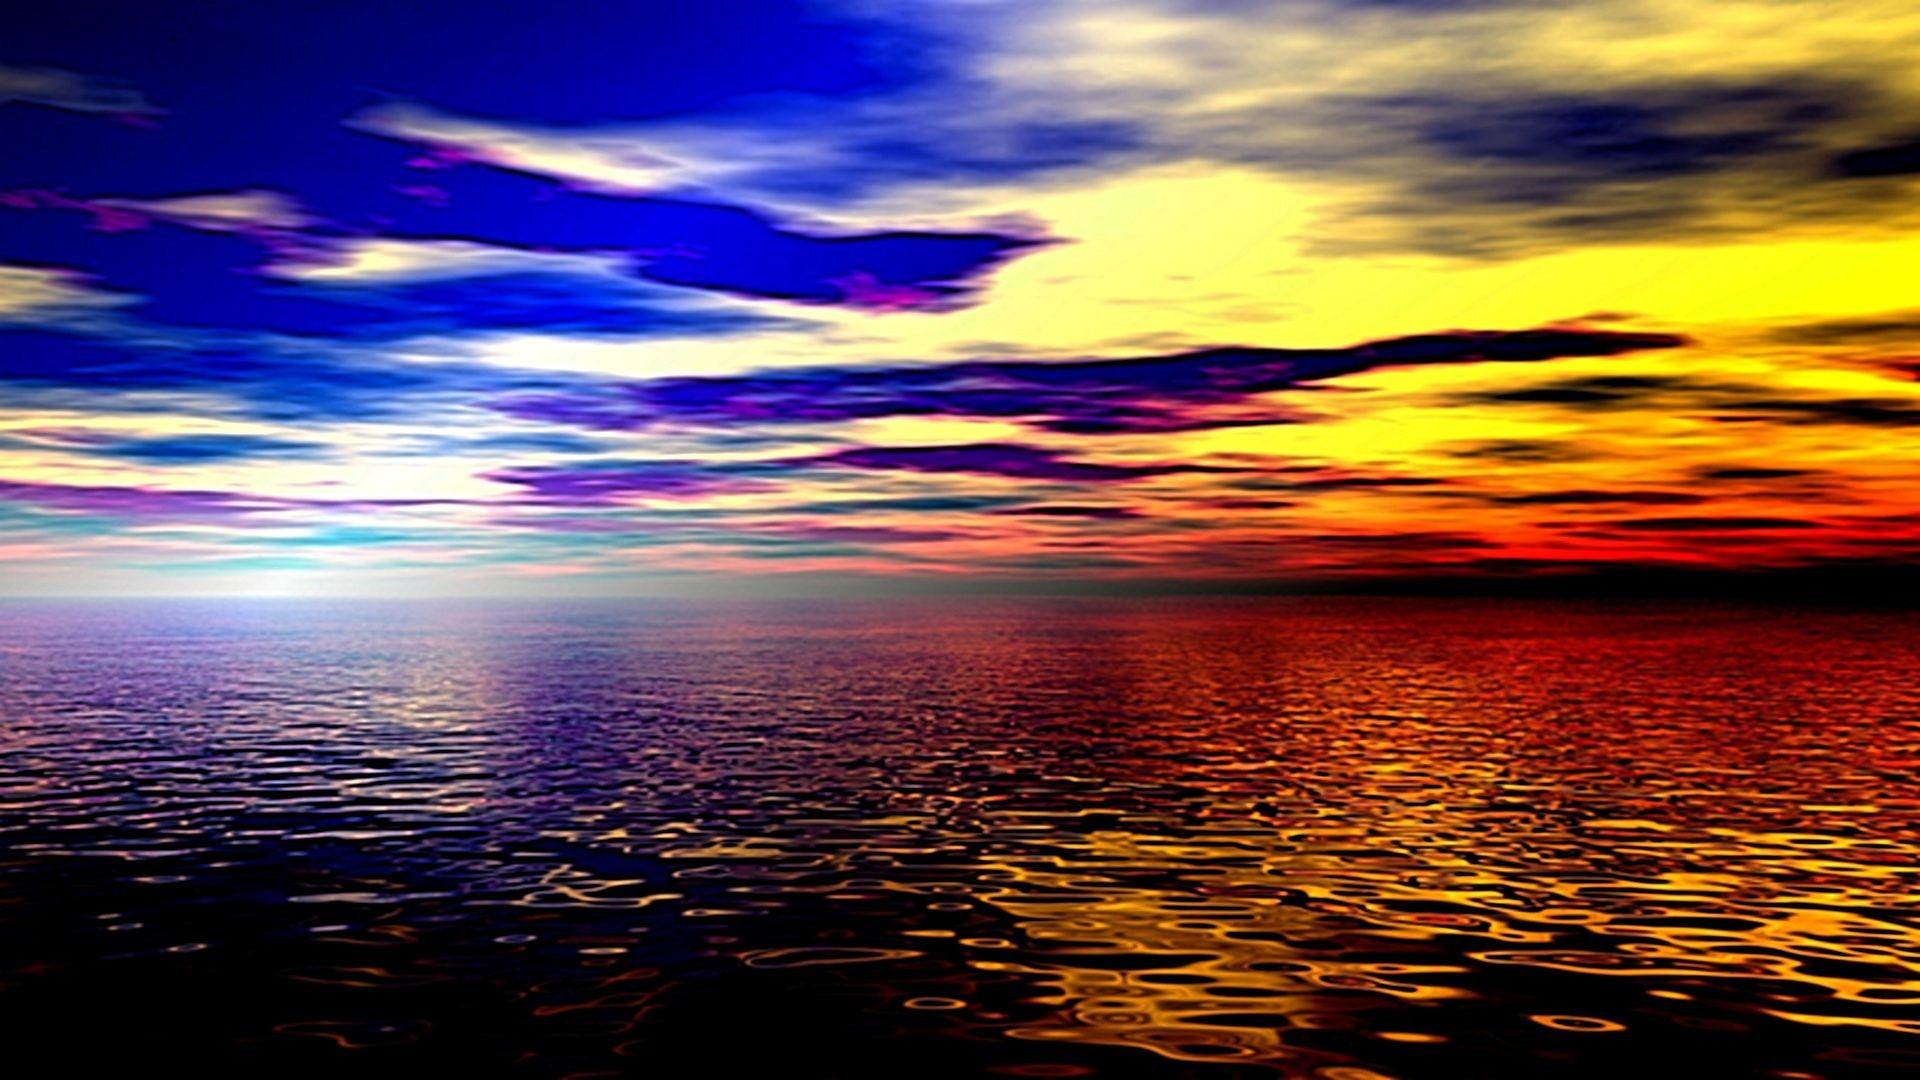 Beach Sunset Background Hd Background Wallpaper High Definition